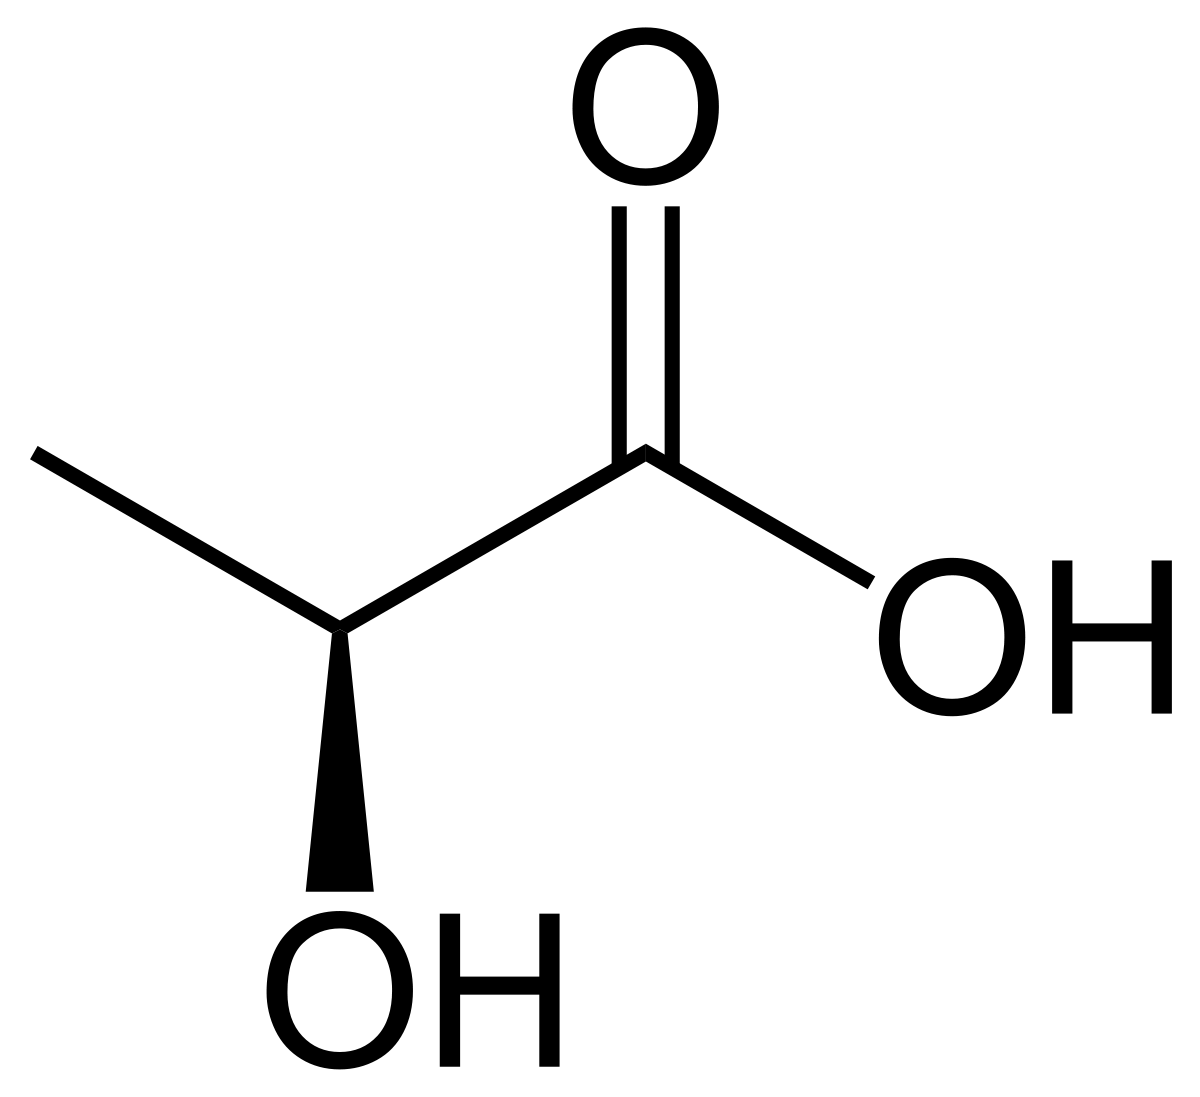 Tẩy da chết hóa học 9